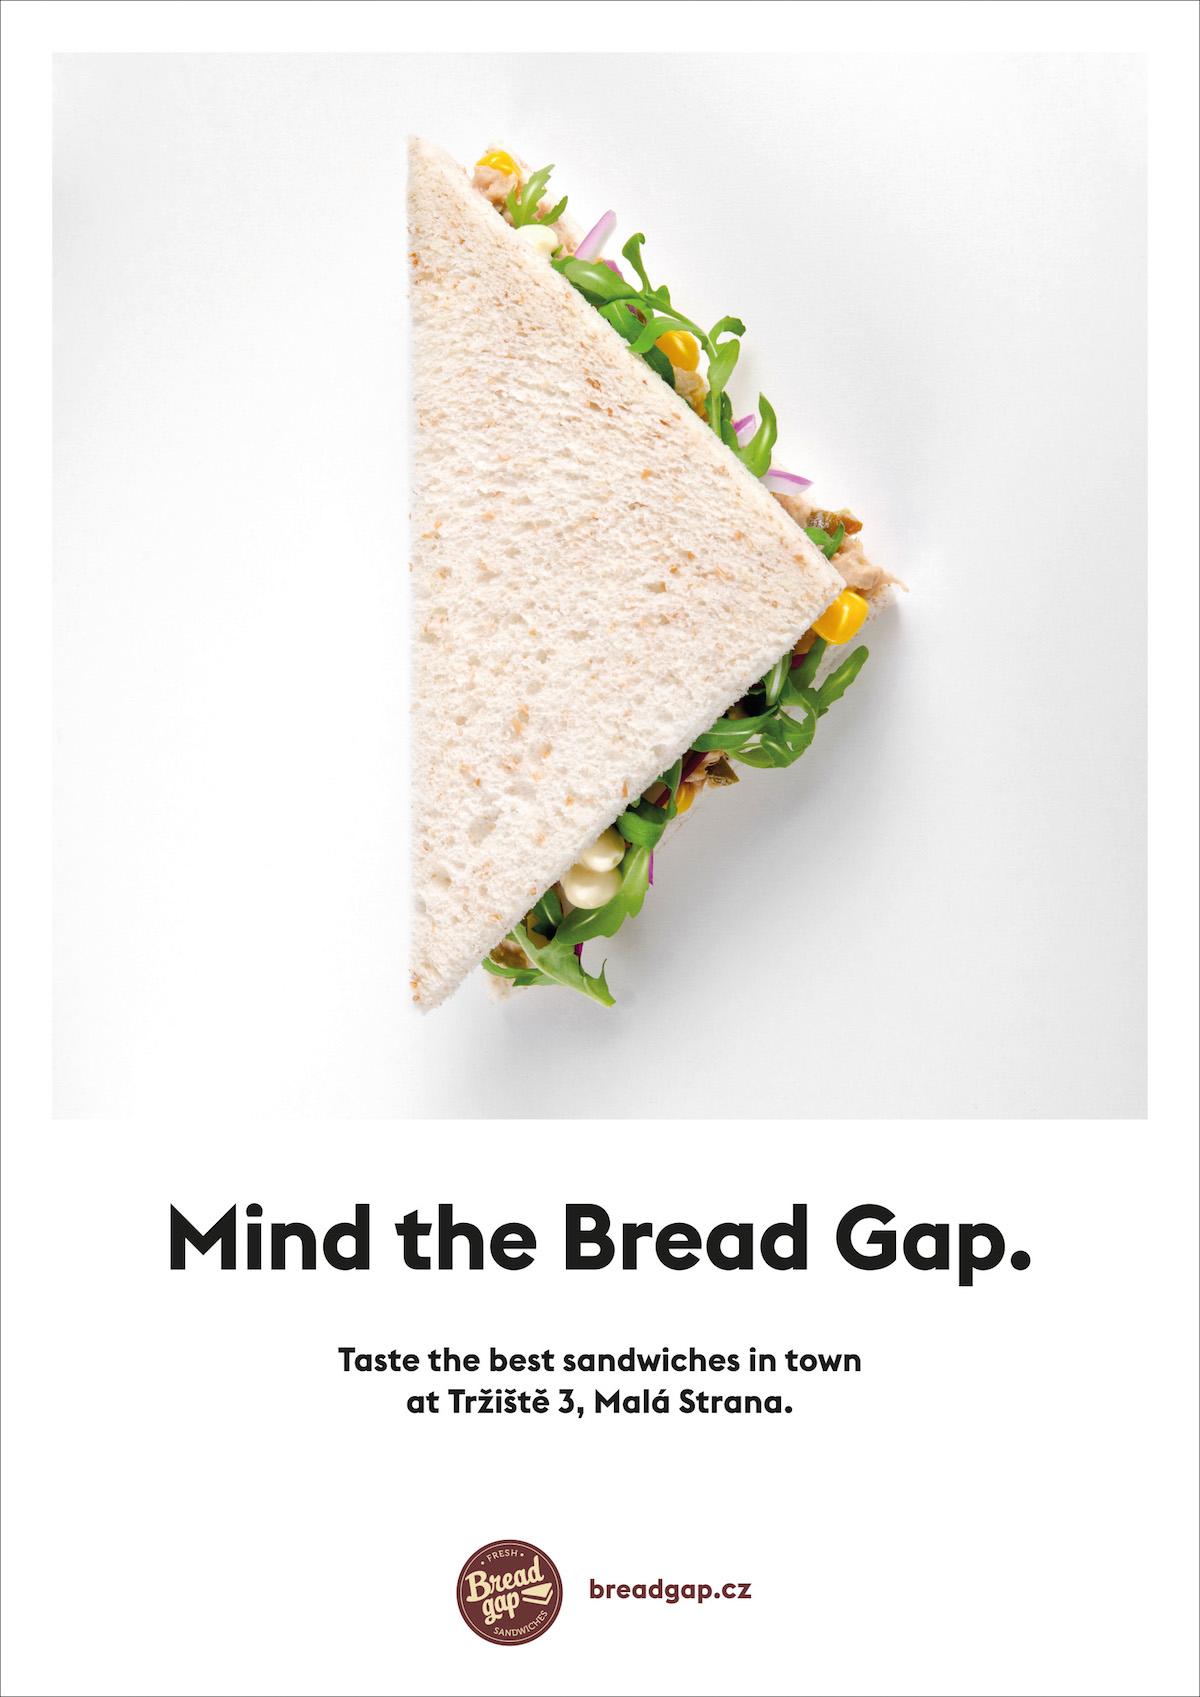 Plakát Bread Gap občerstvovny v centru Prahy